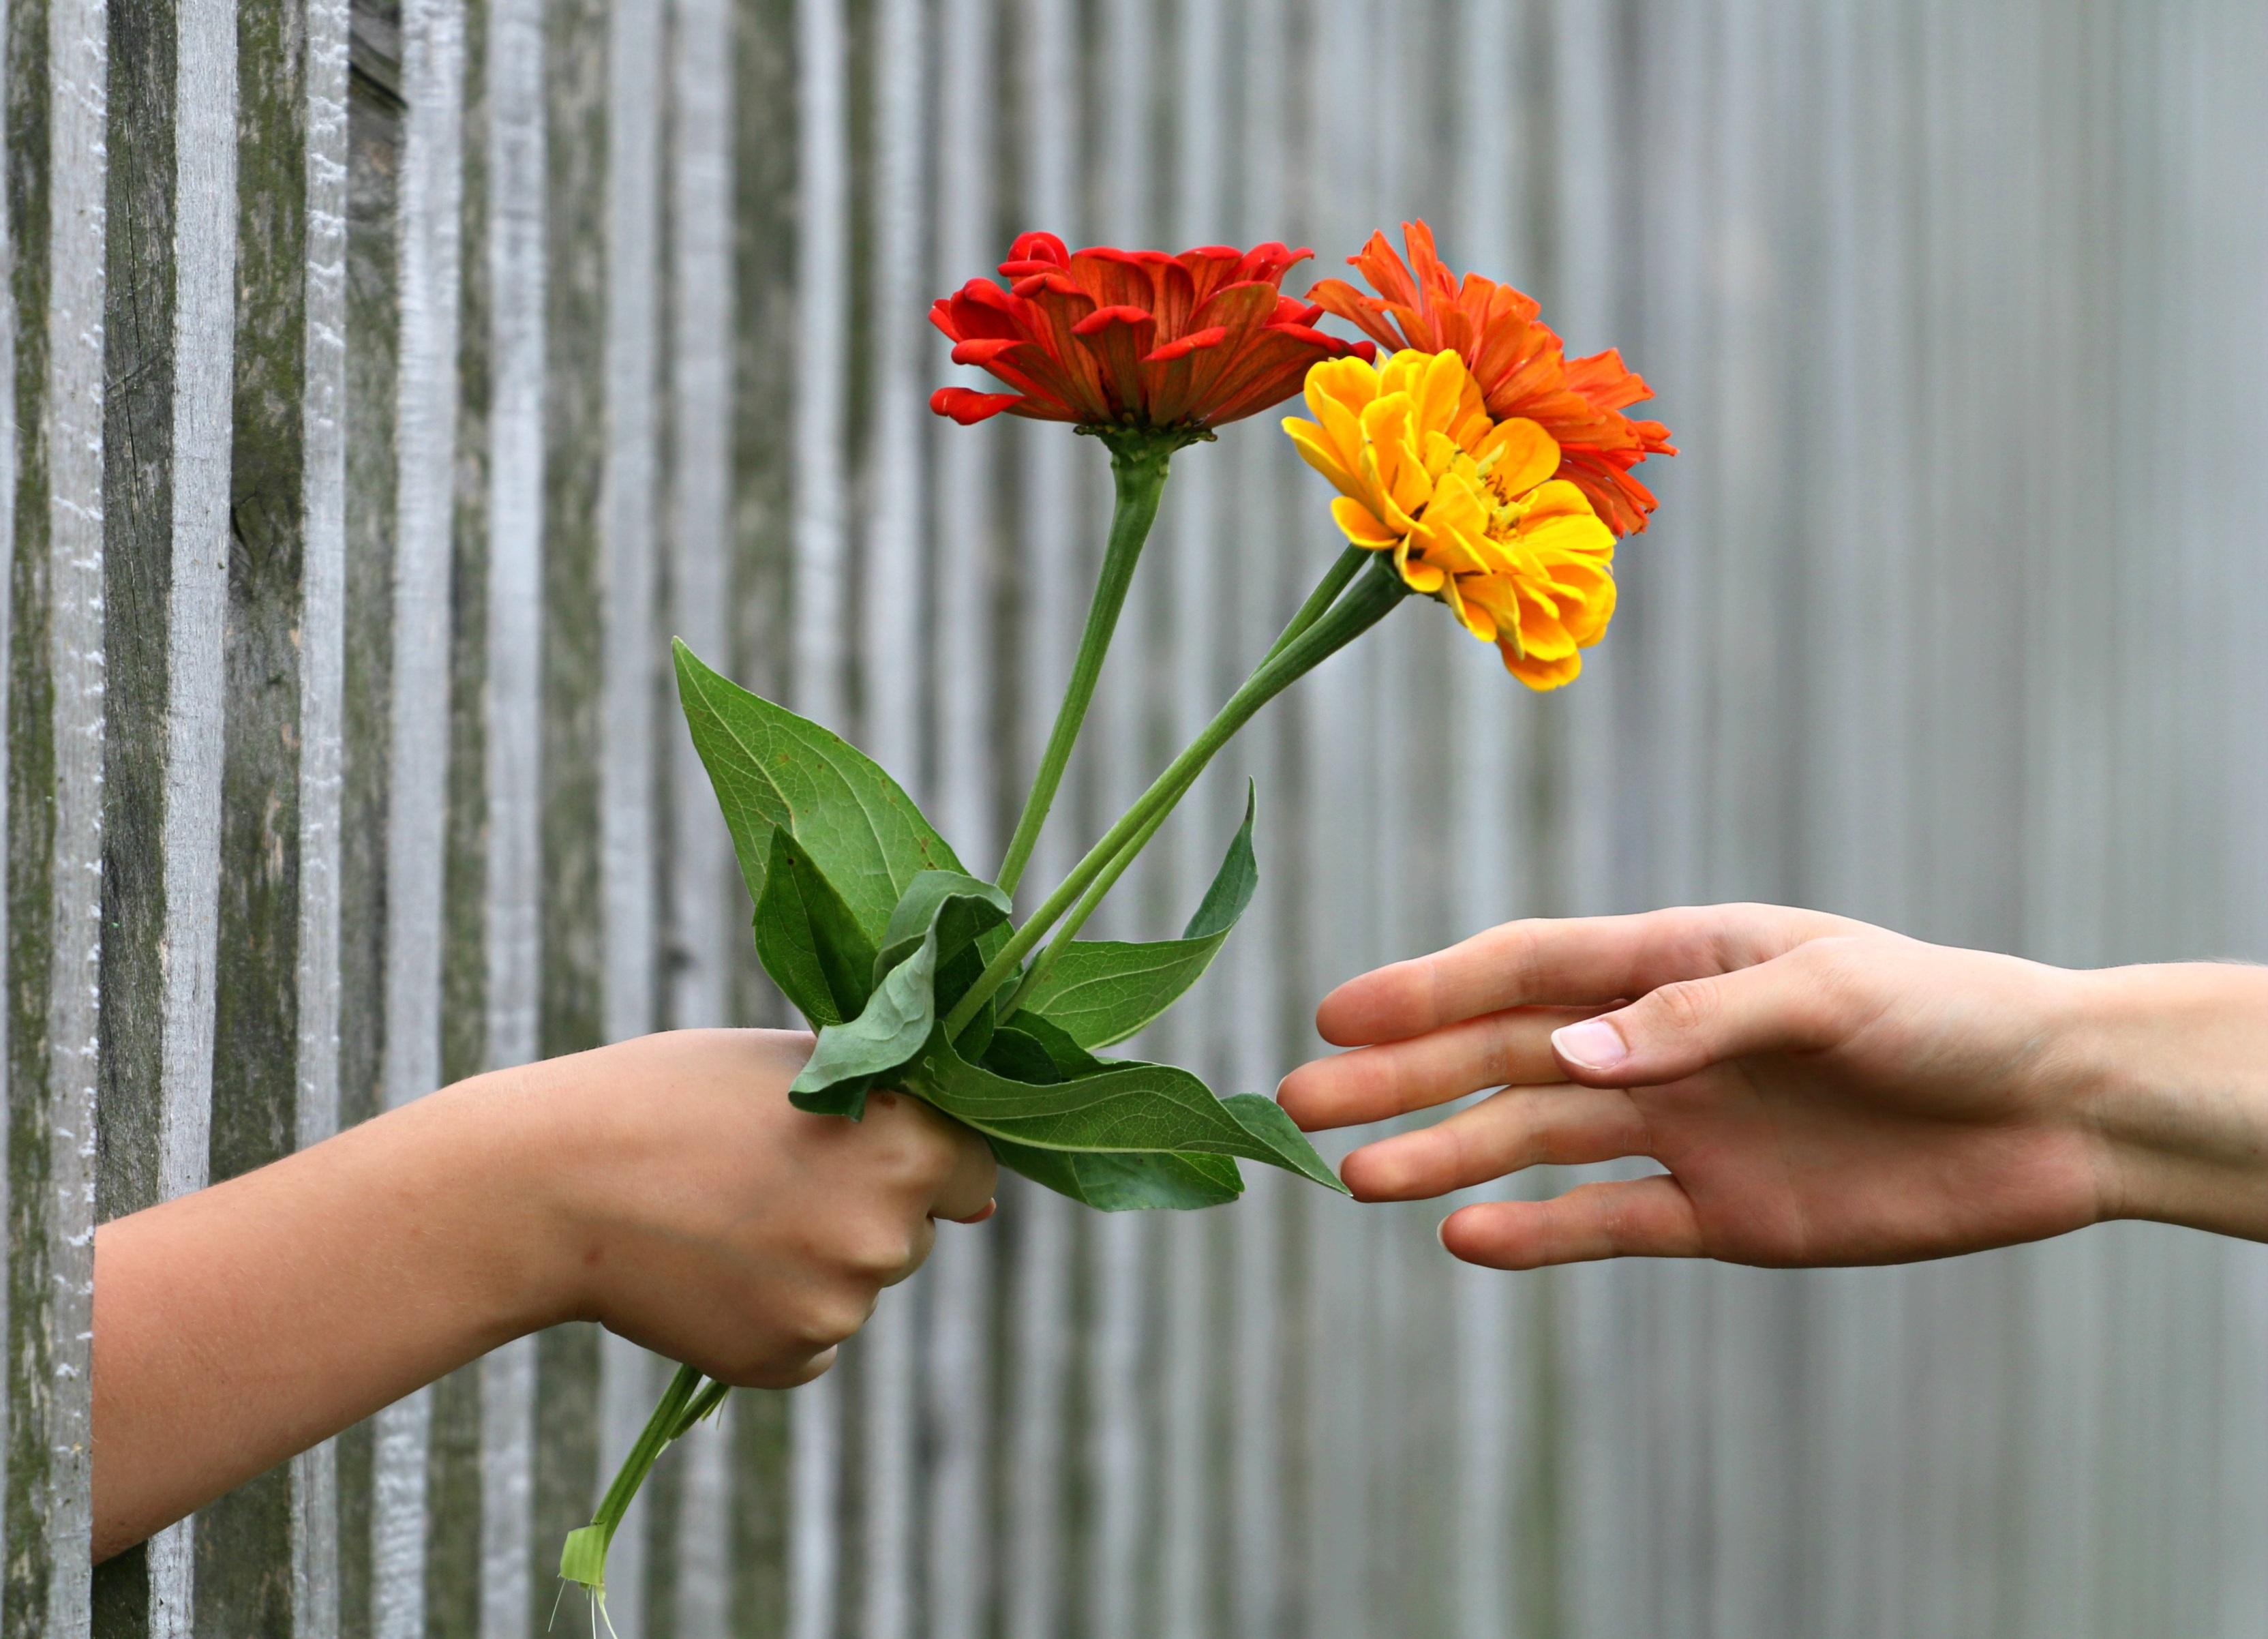 Free Images : hand, fence, petal, gift, botany, flora, flowers ...